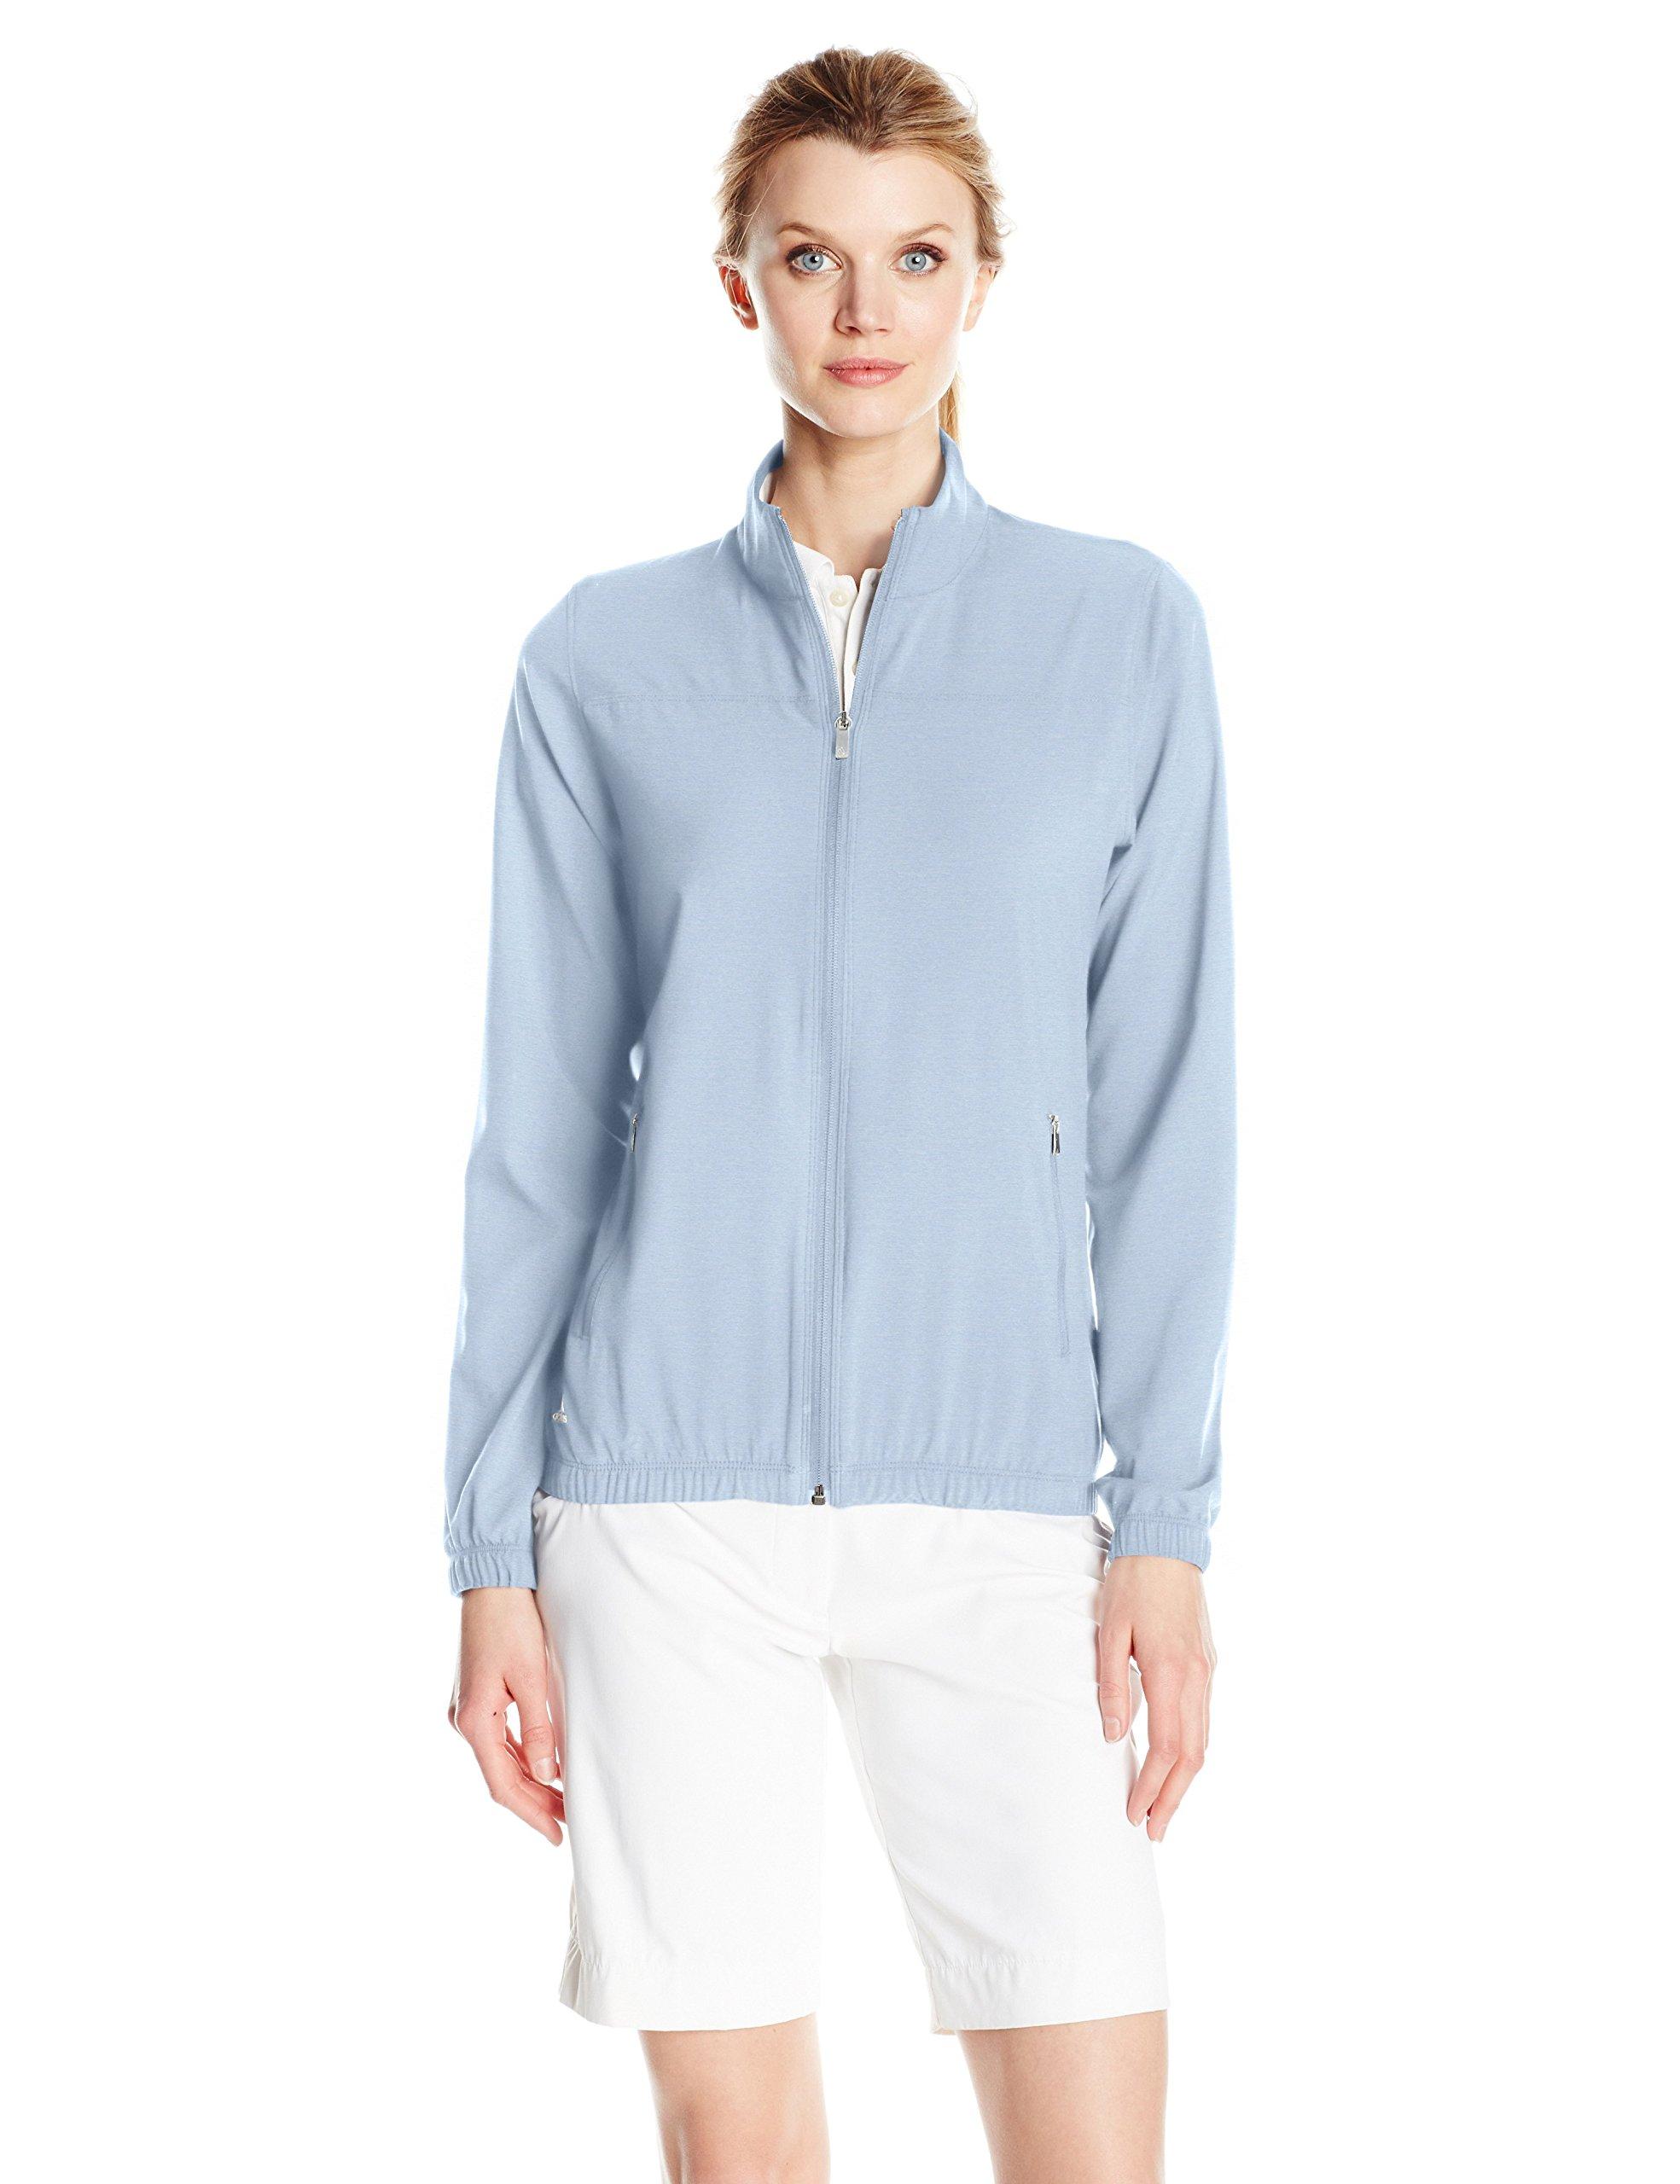 adidas Golf Women's Essential Wind Jacket, Large, Vision Blue Heather